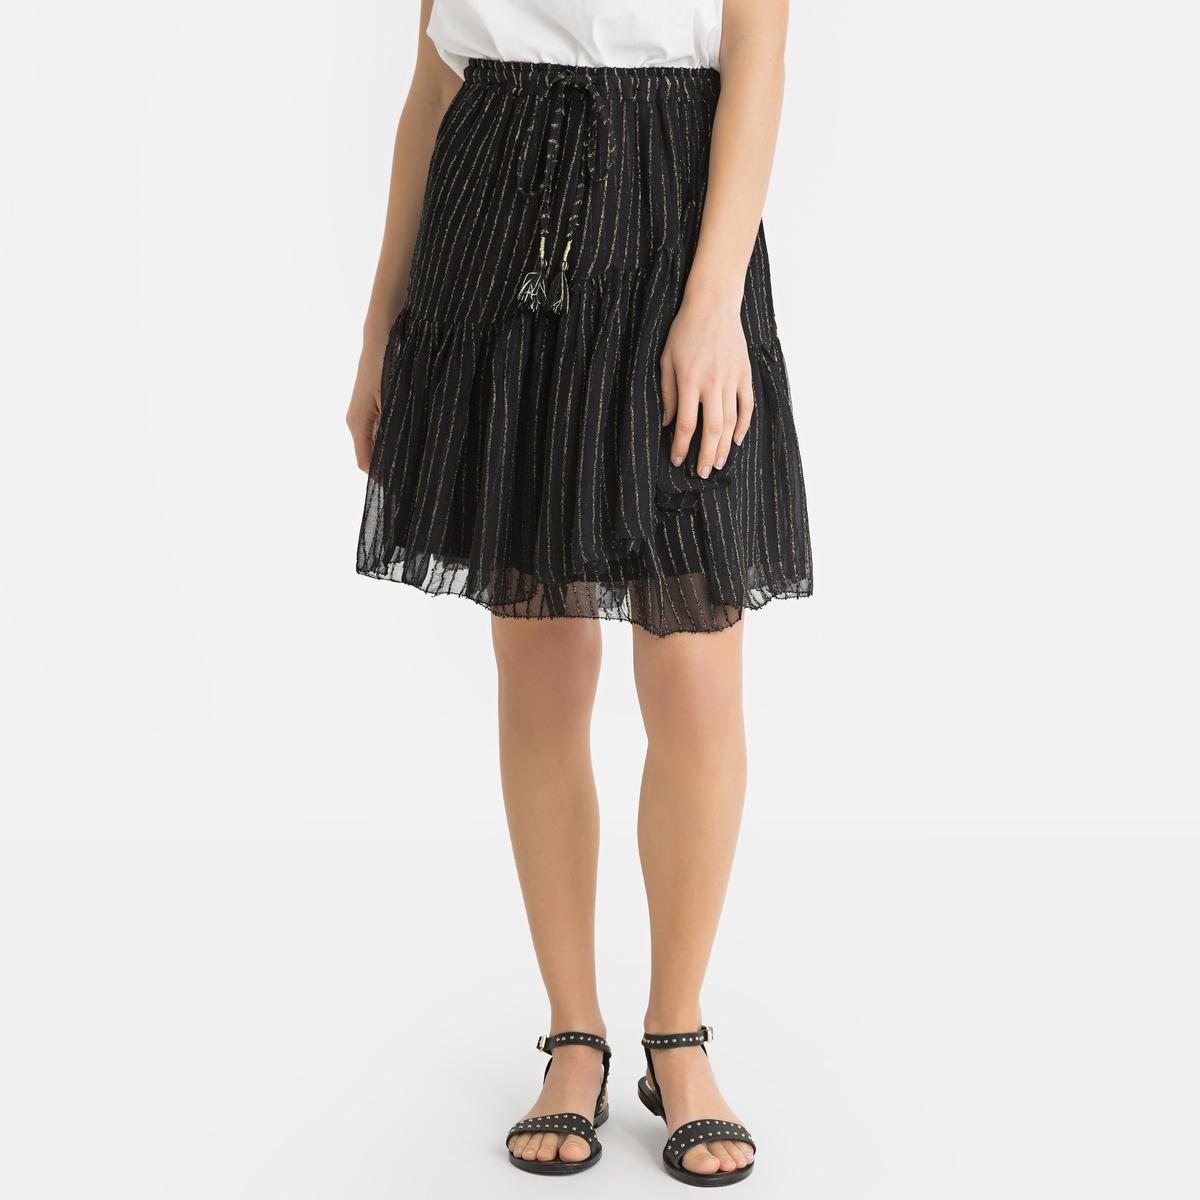 Юбка La Redoute Короткая расклешенная из вуали OLLY 1(S) черный юбка la redoute короткая расклешенная с цветочным рисунком и оборками на поясе xs бежевый